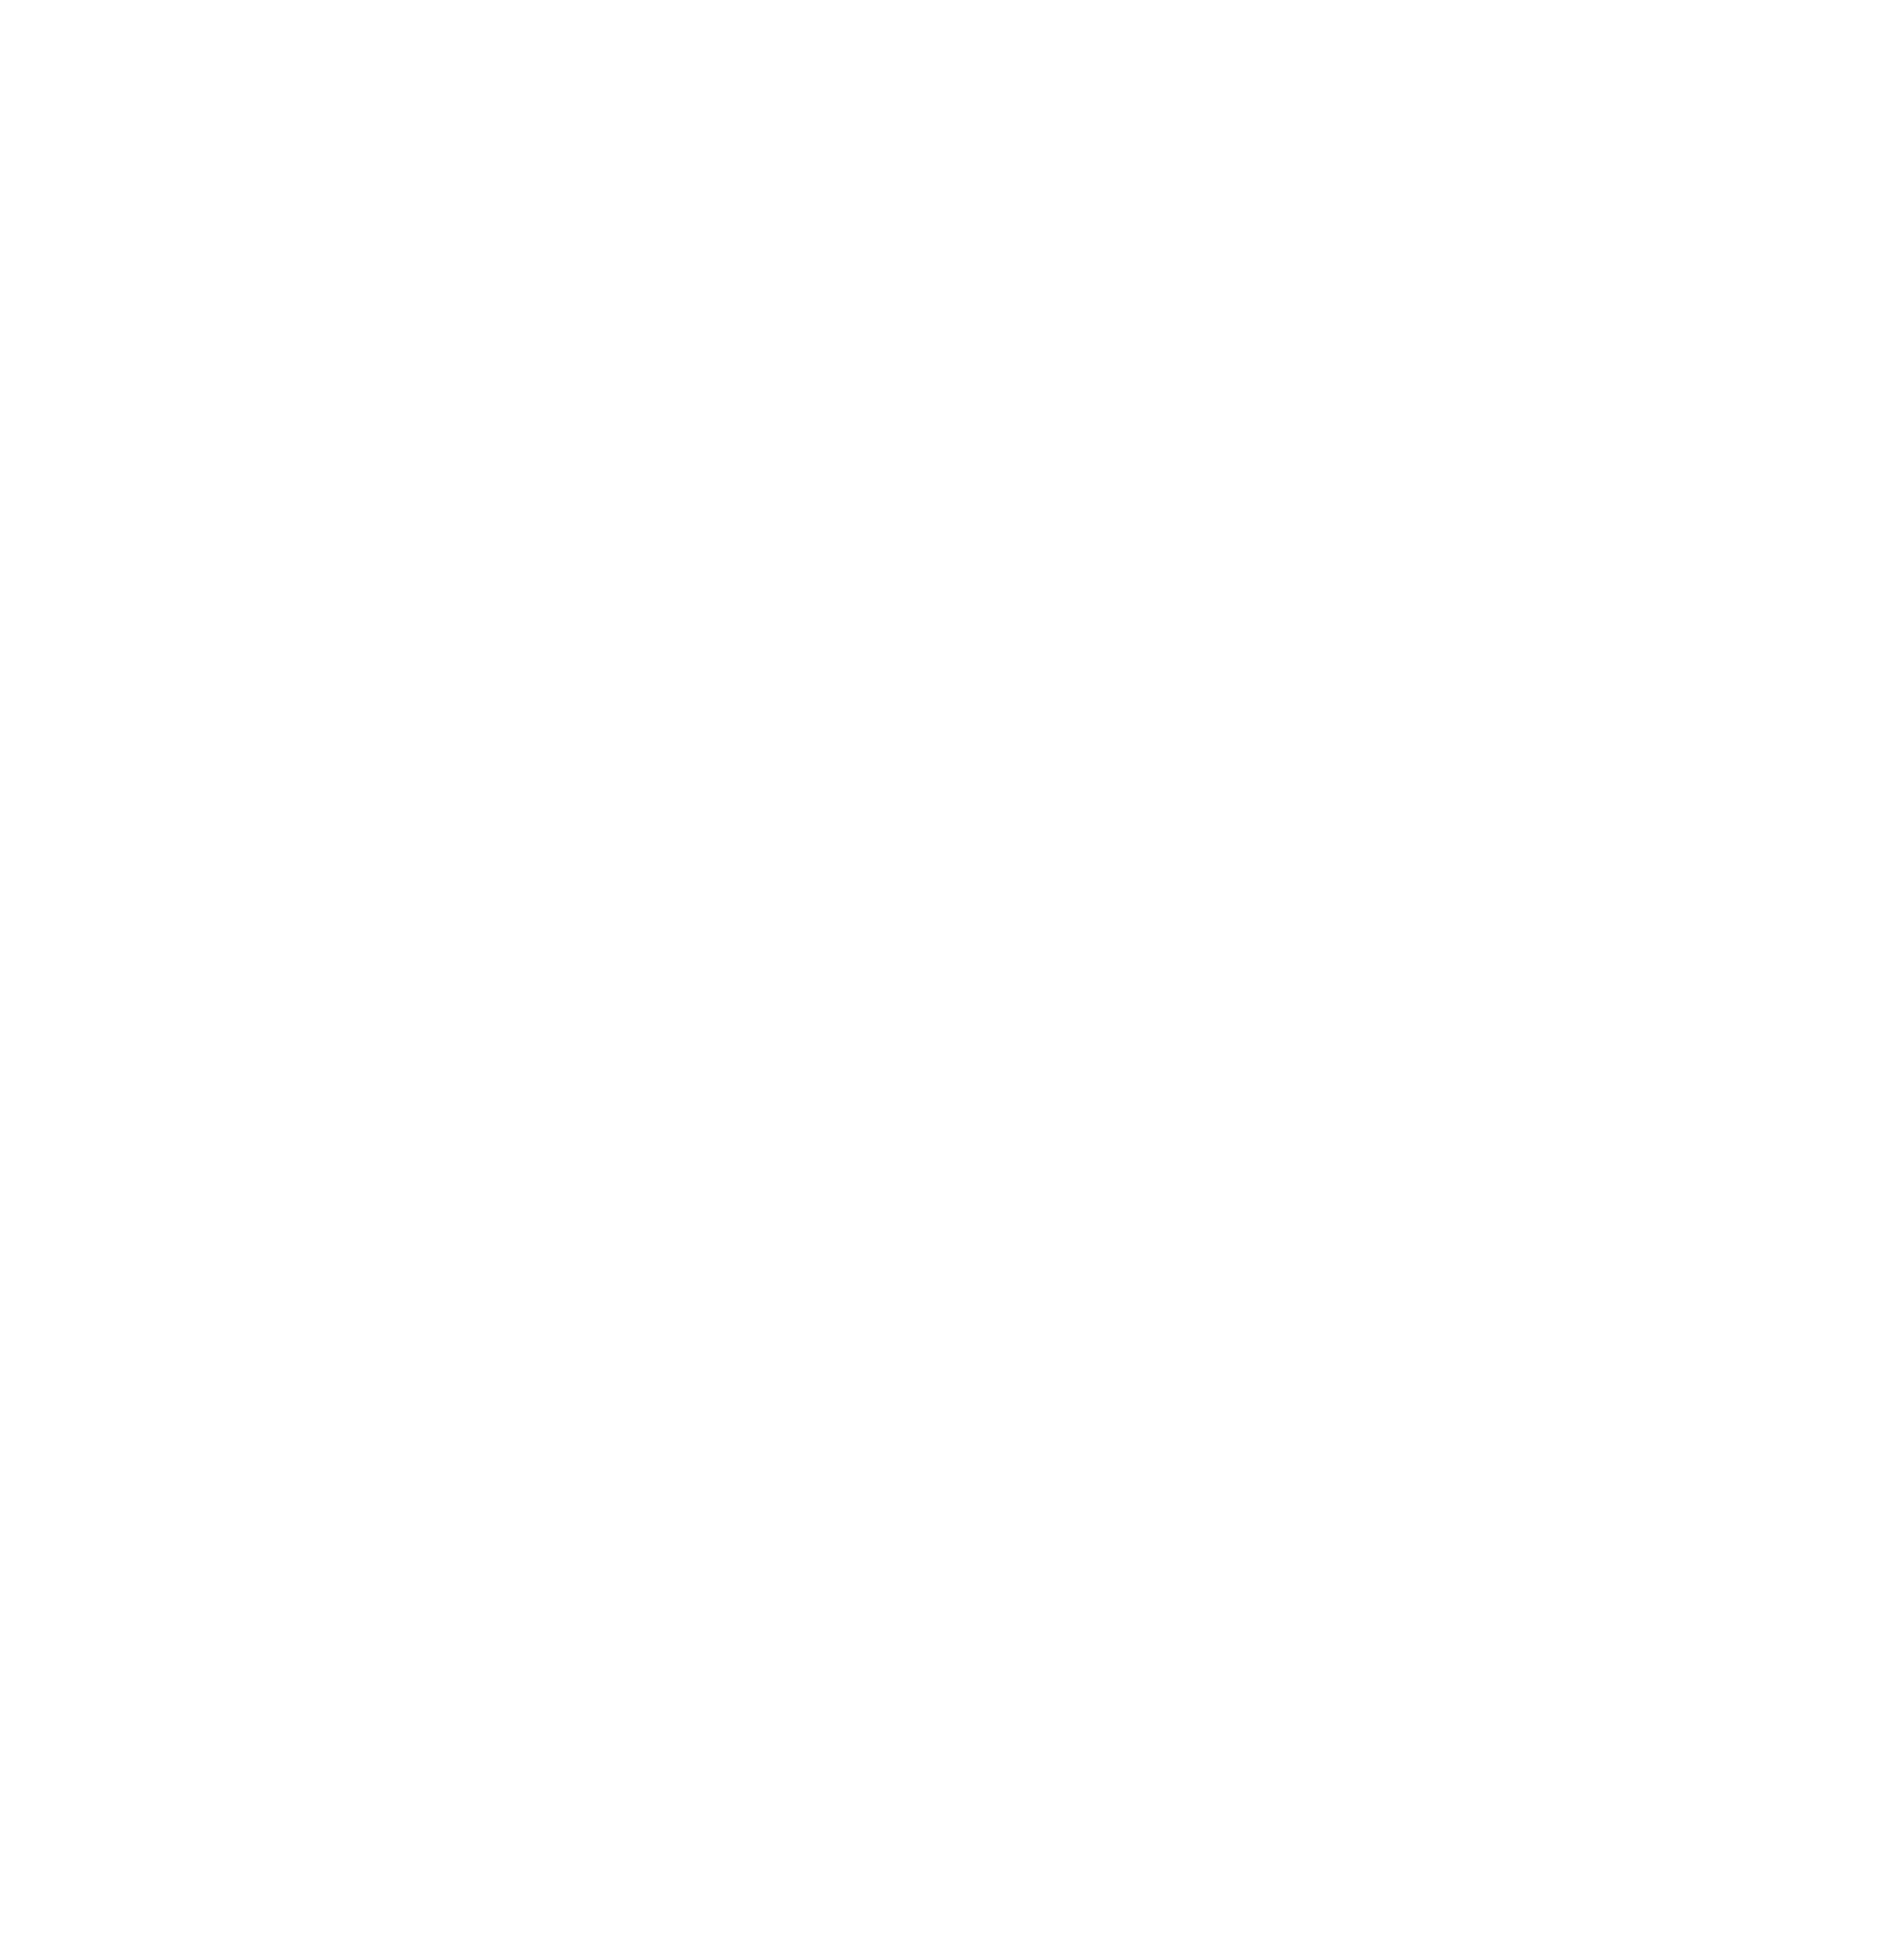 Fusteria Sergi